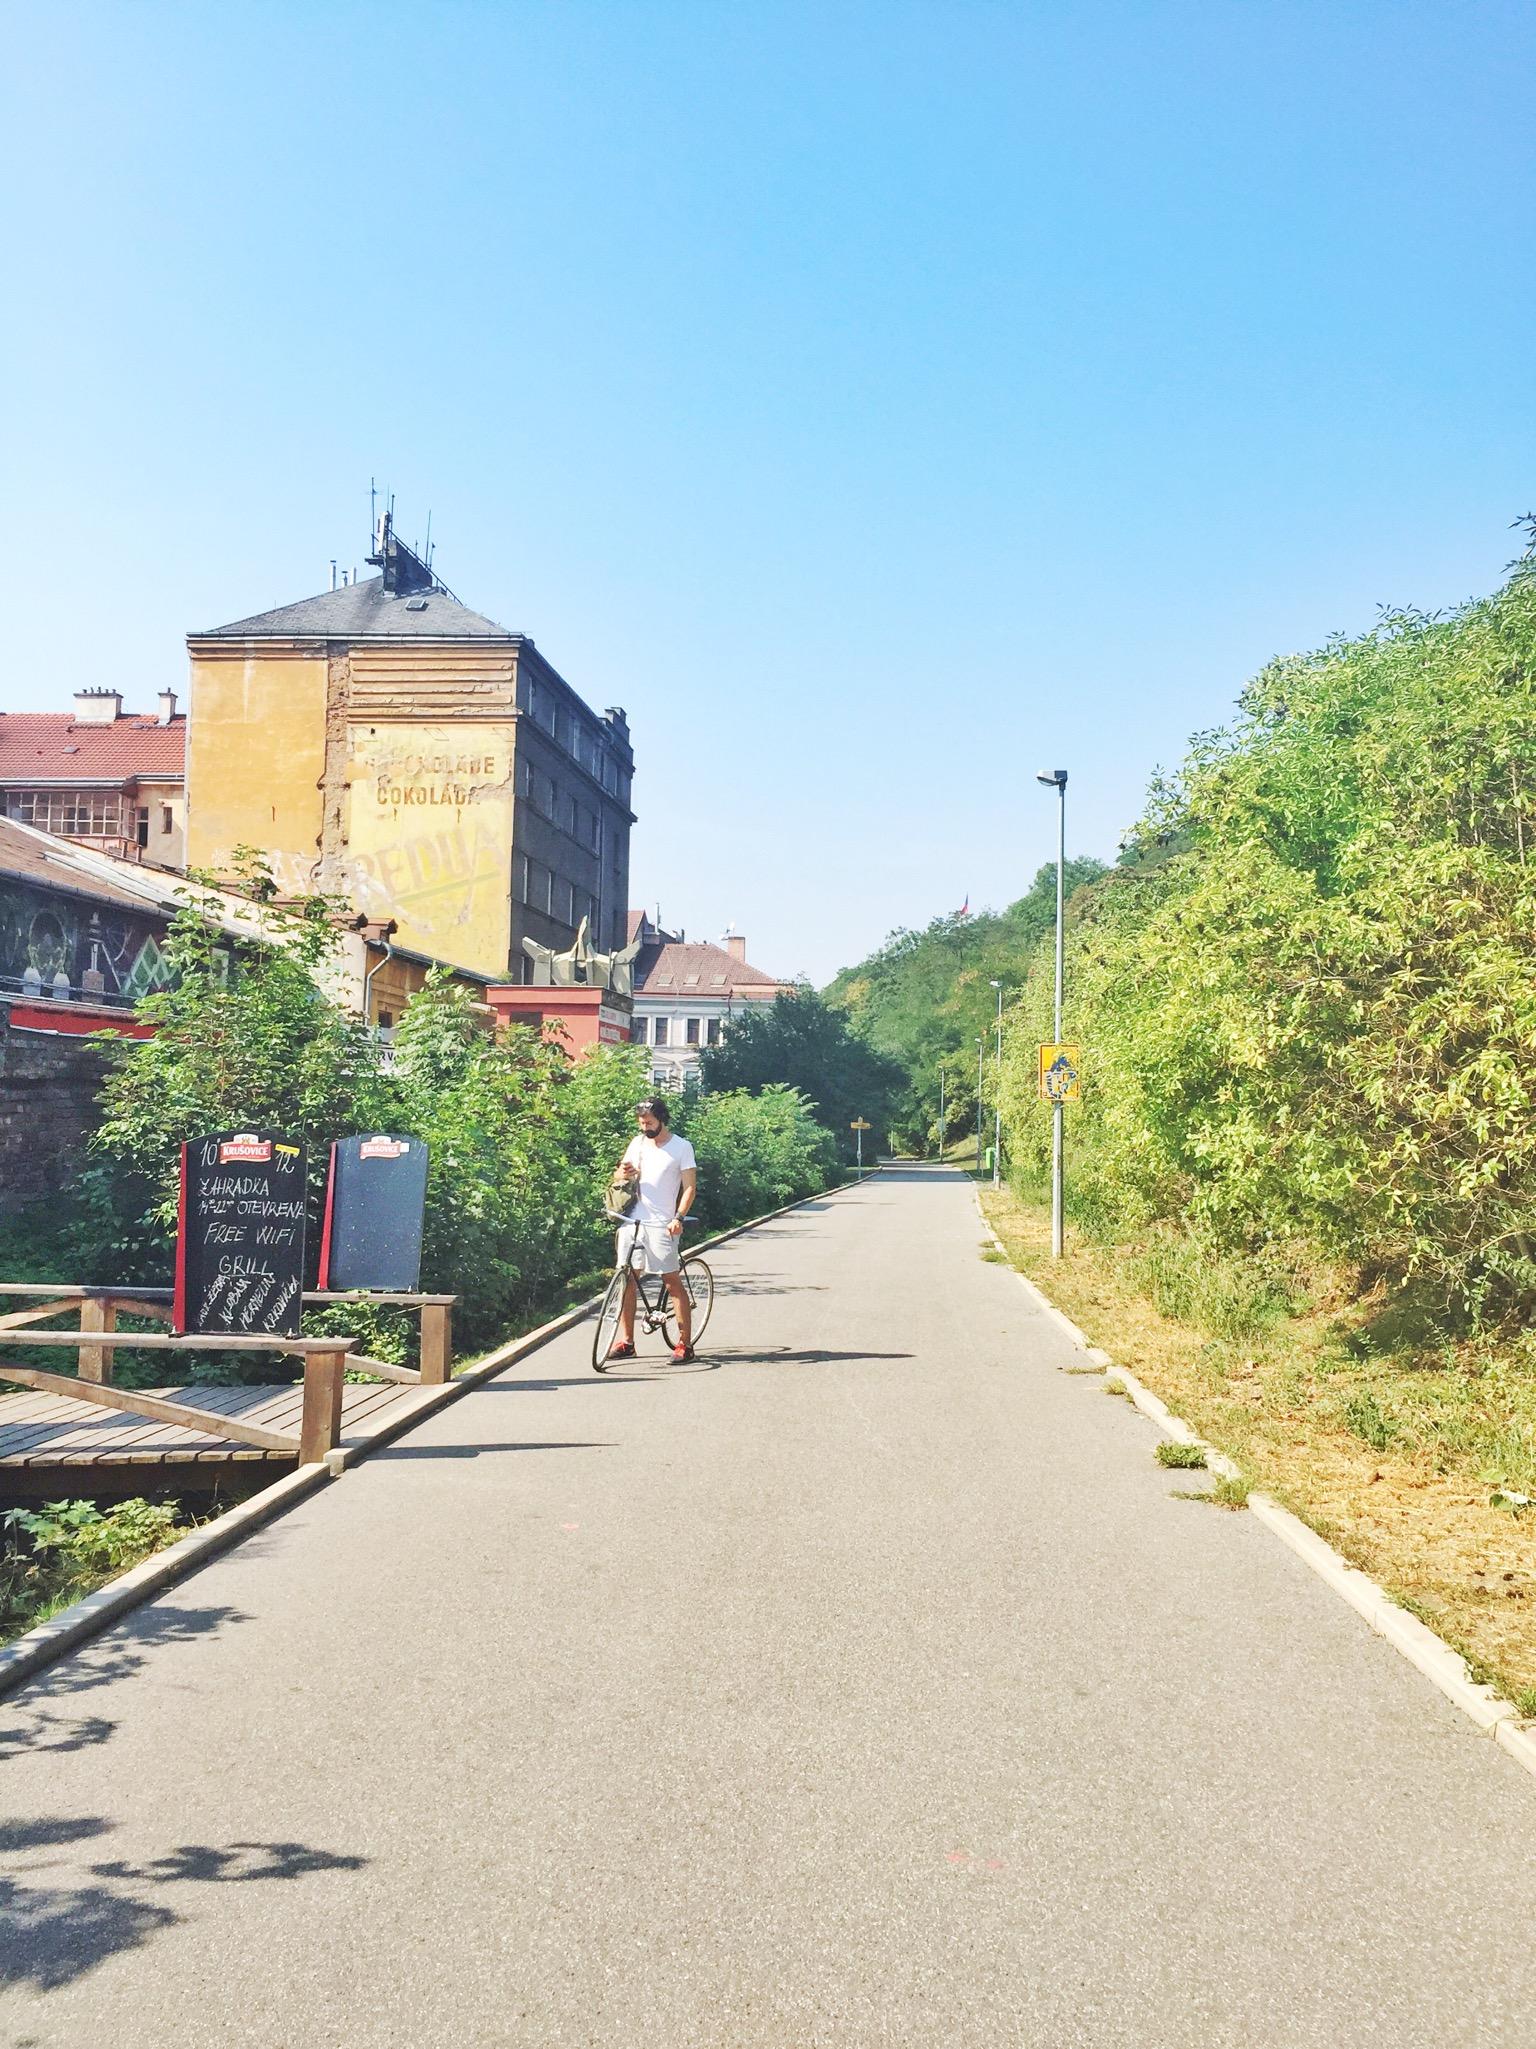 Urban Kristy Discoveries - September - Biking in Prague